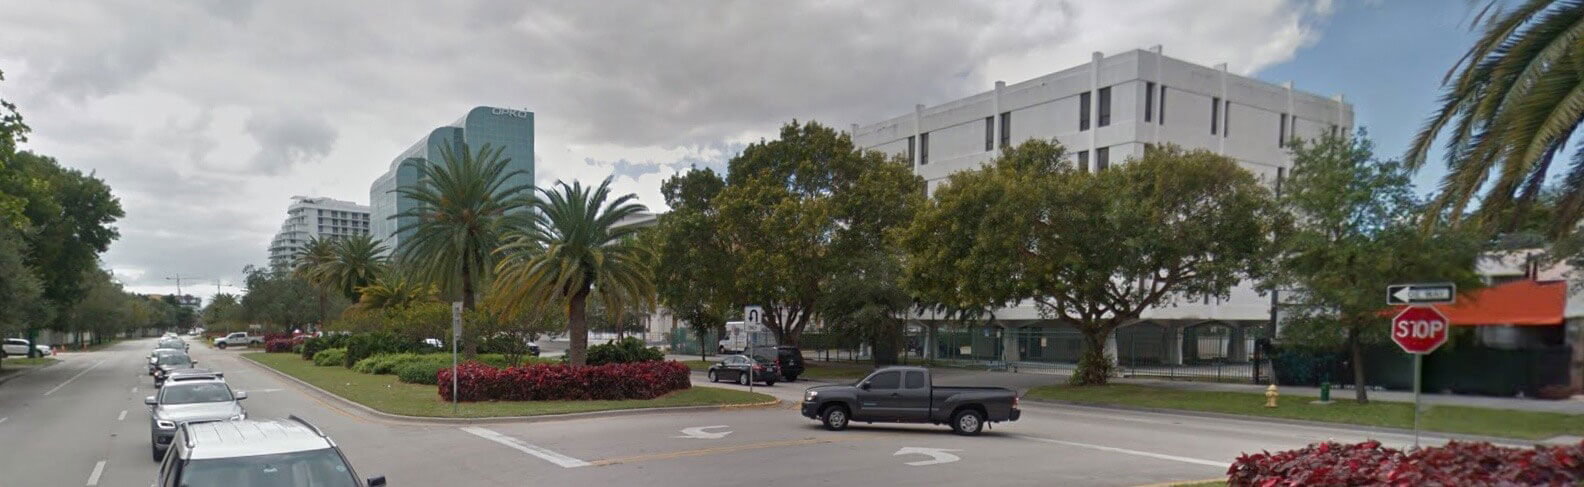 Miami Dade - Score At The Top